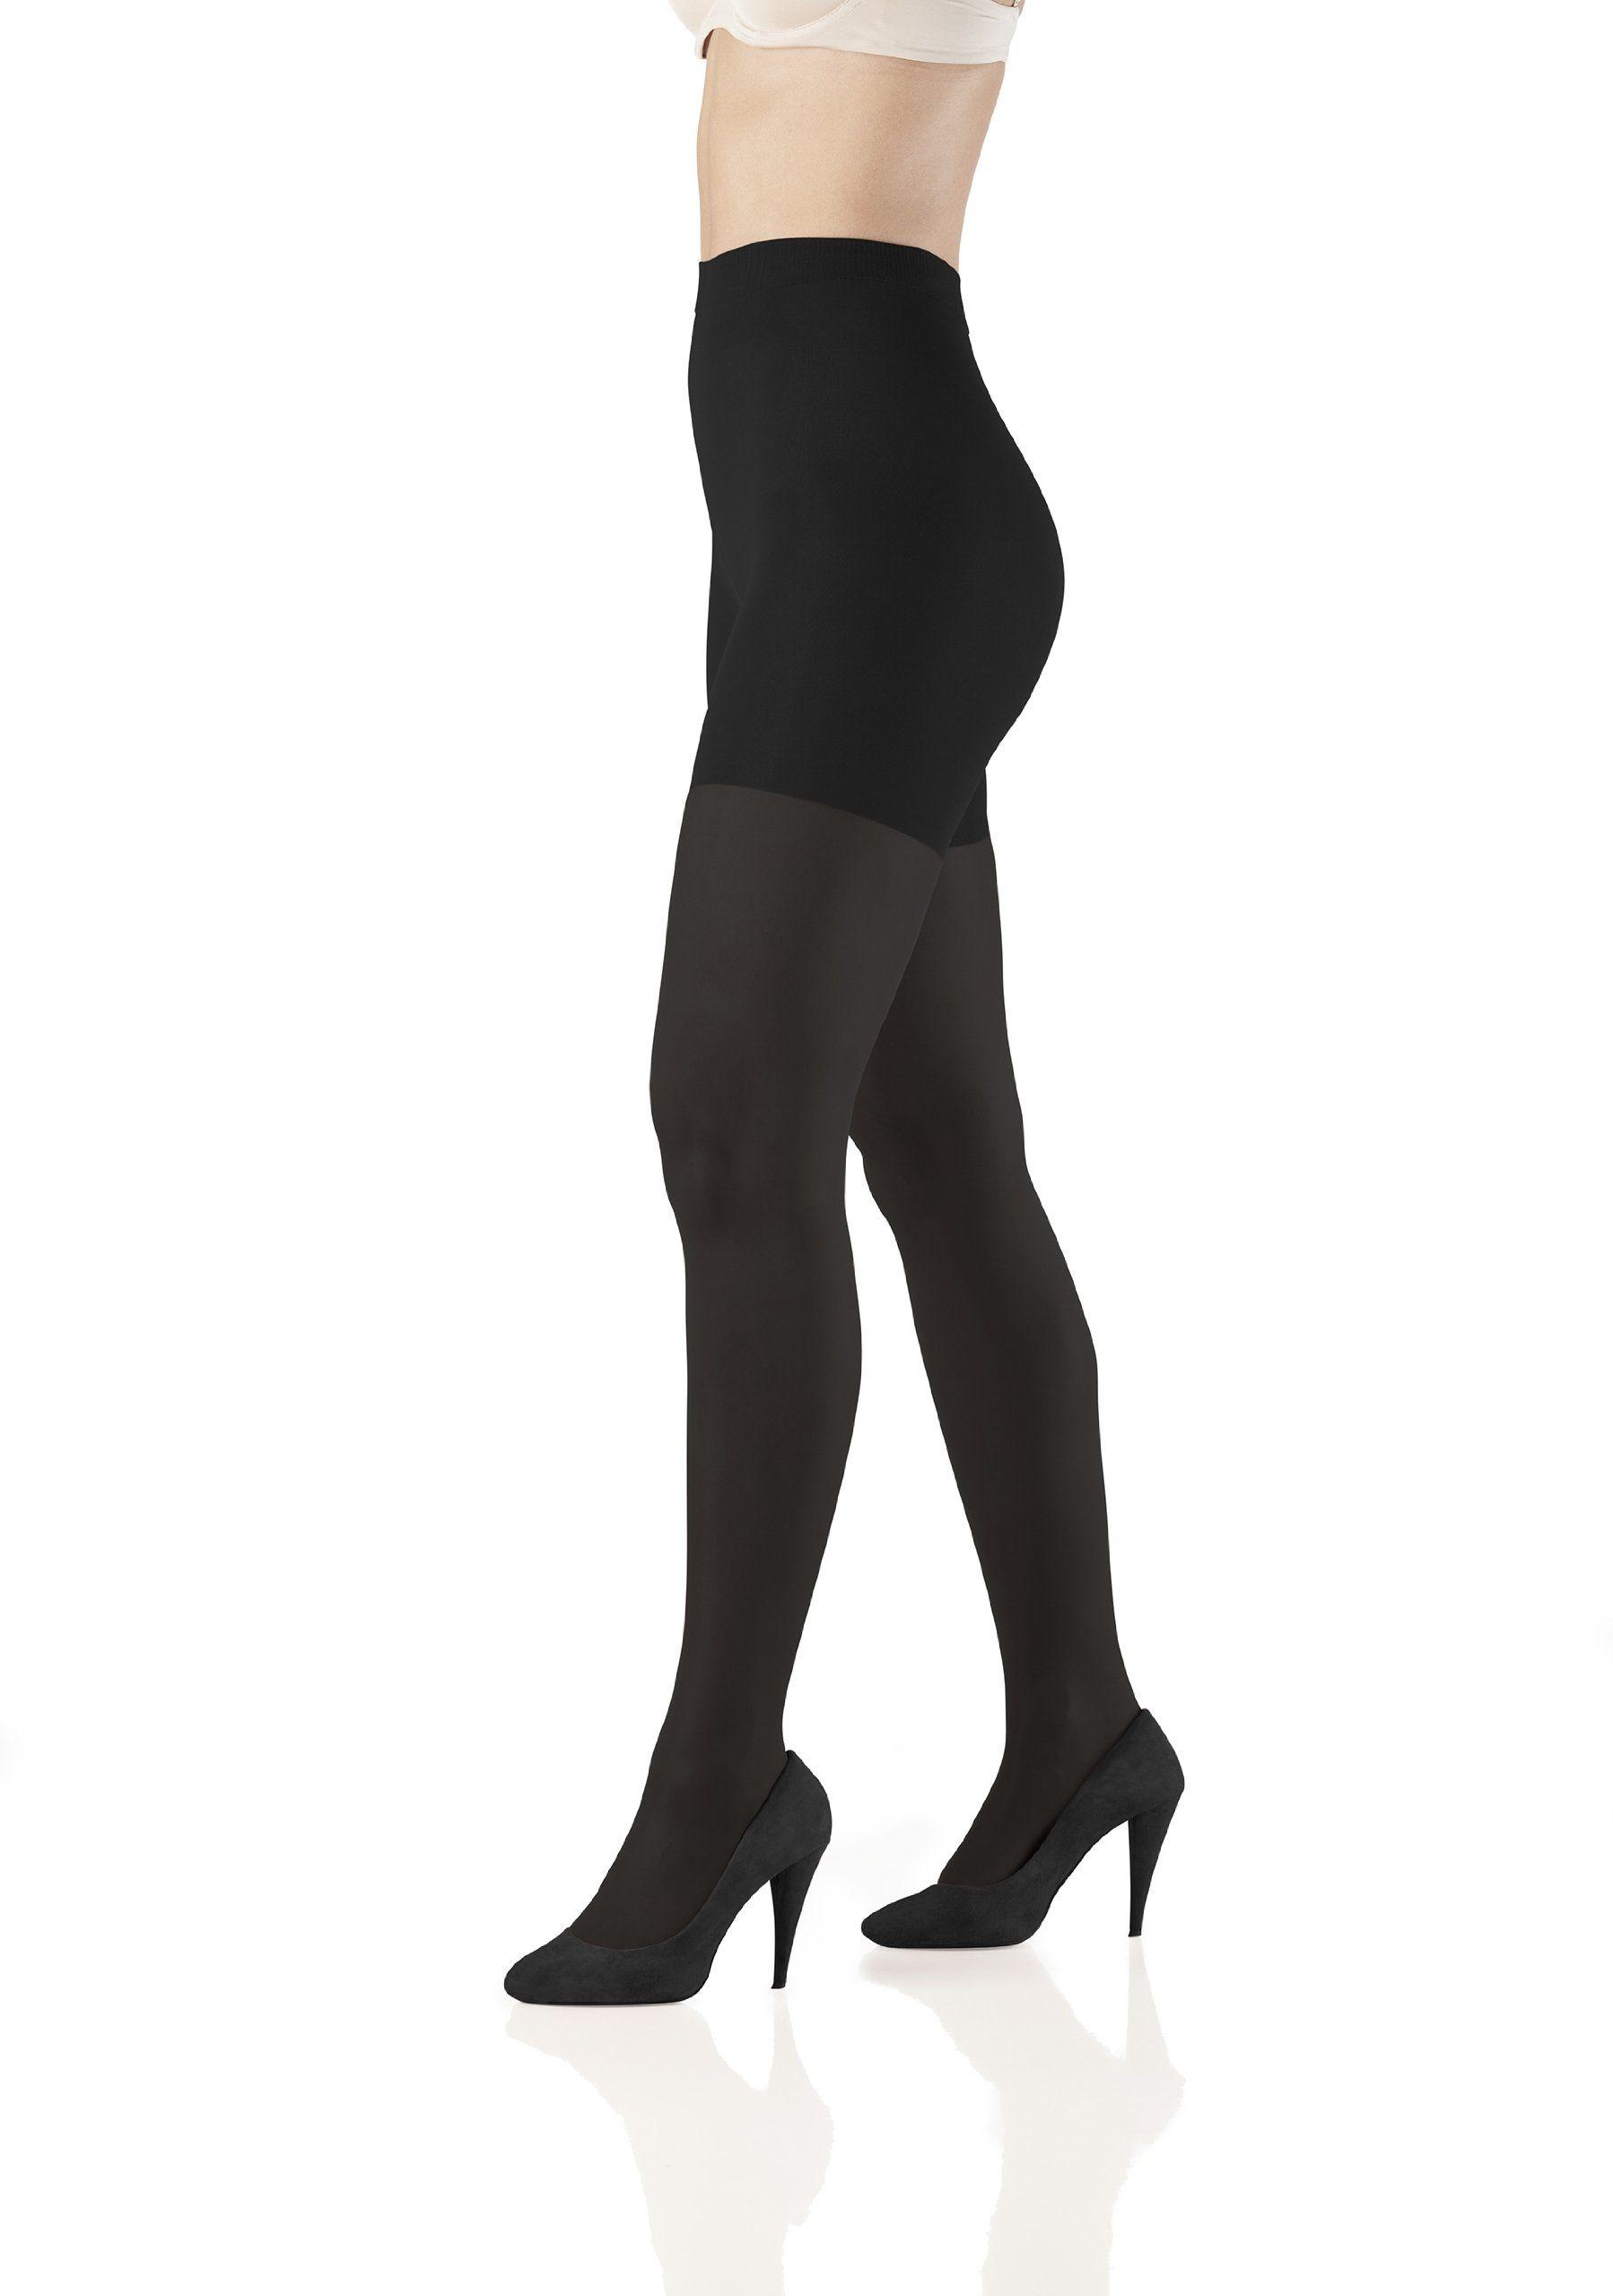 8a5dedadb Maternity Fashion - hard-wearing maternity leggings   Normal Waist Shaping  Tights – 30 DEN sheer satin look 44030 Size XL Black   Wish to know  a lot ...